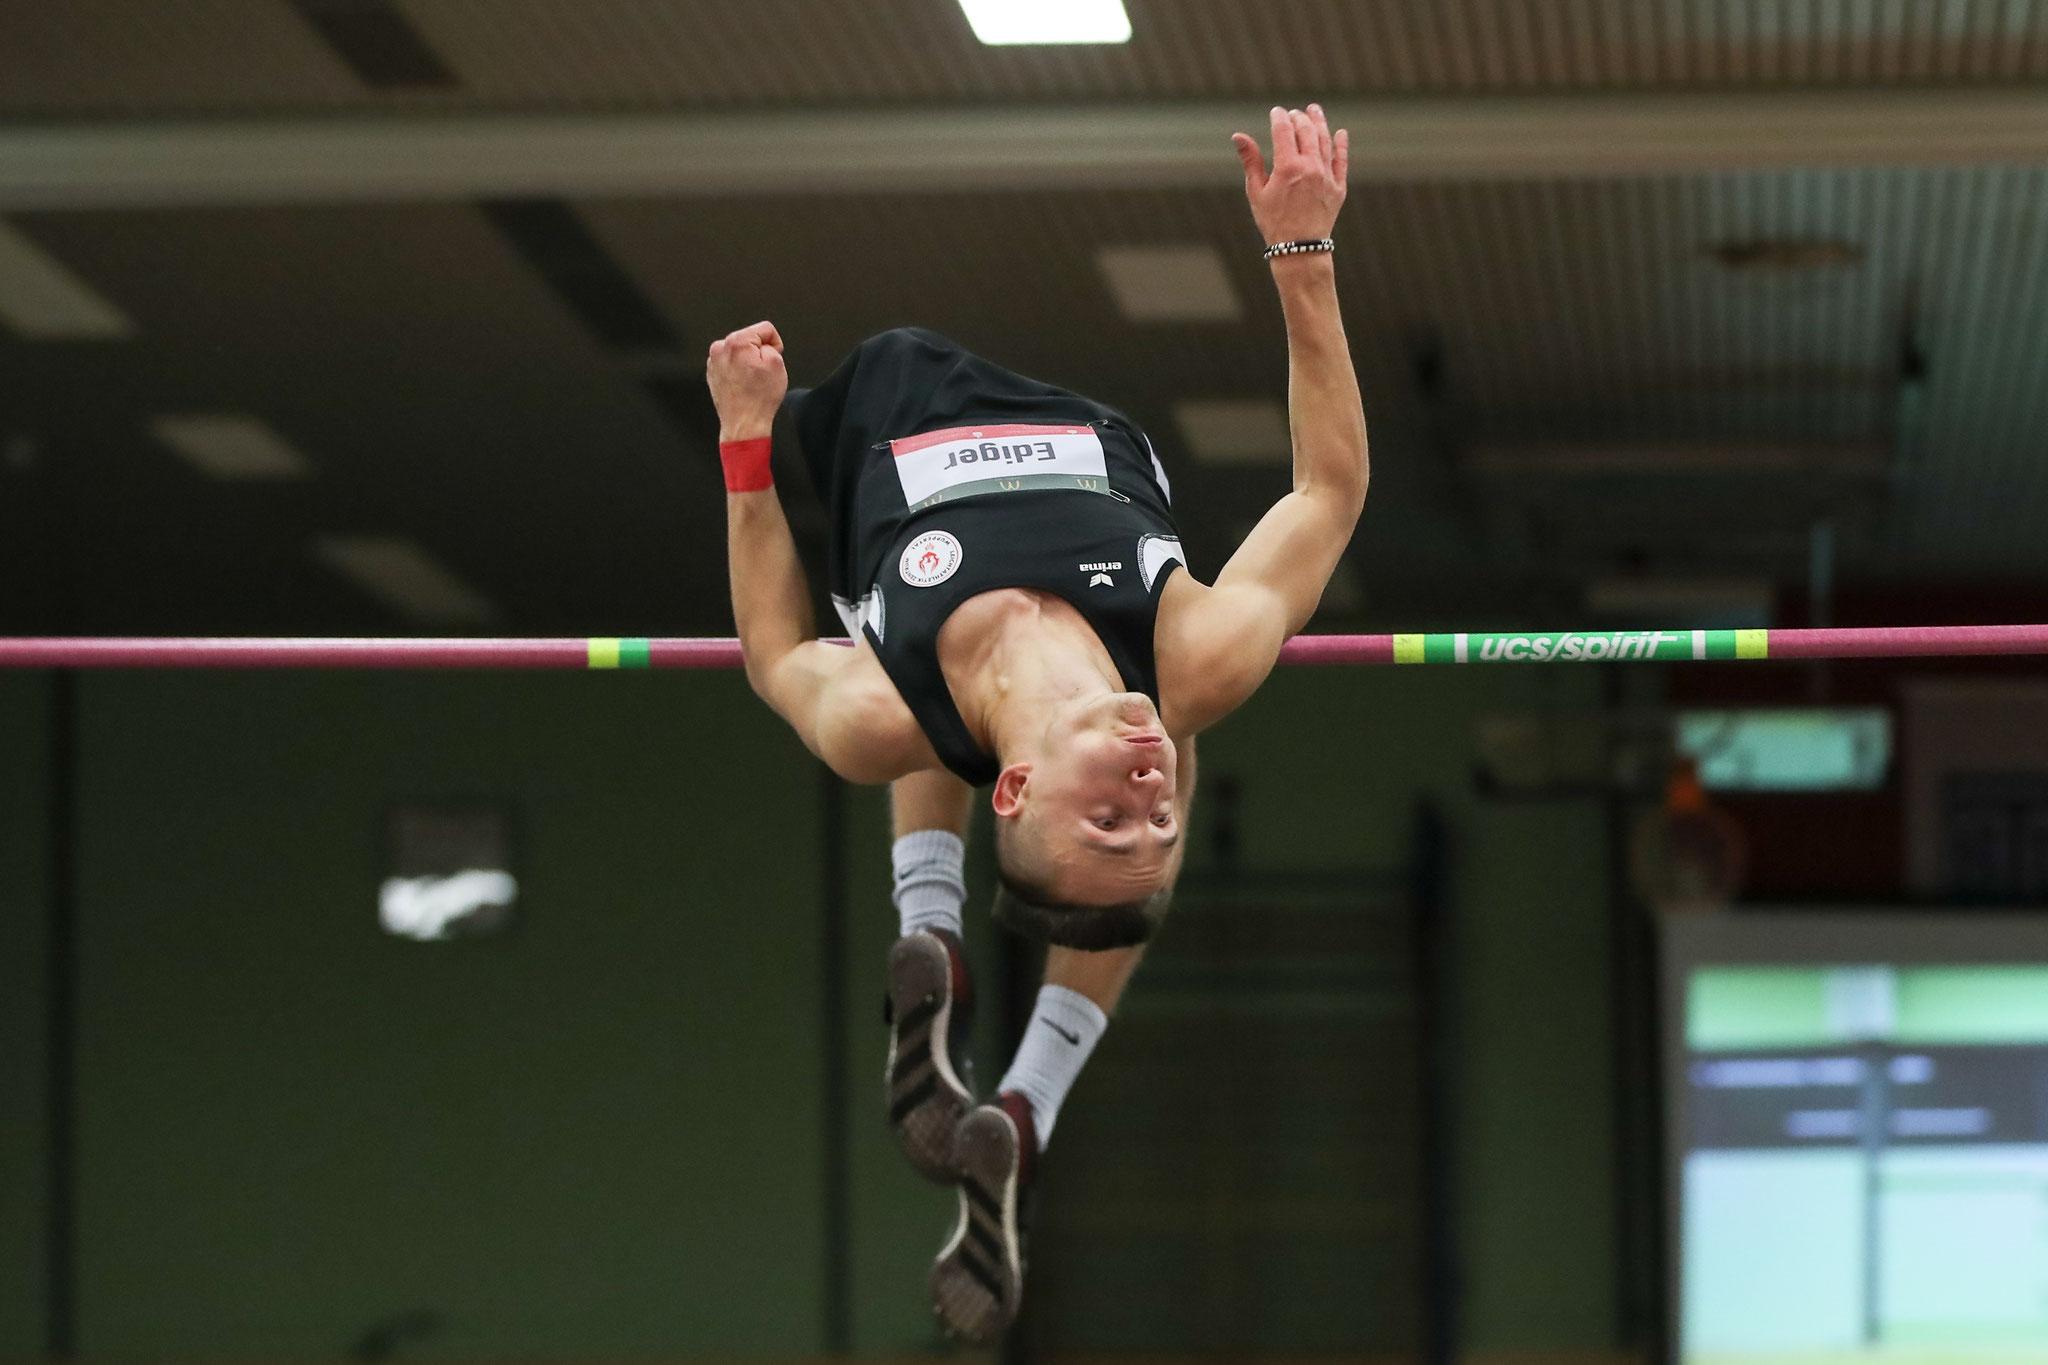 Tom Ediger (Foto: Footcorner/Dirk Fußwinkel)